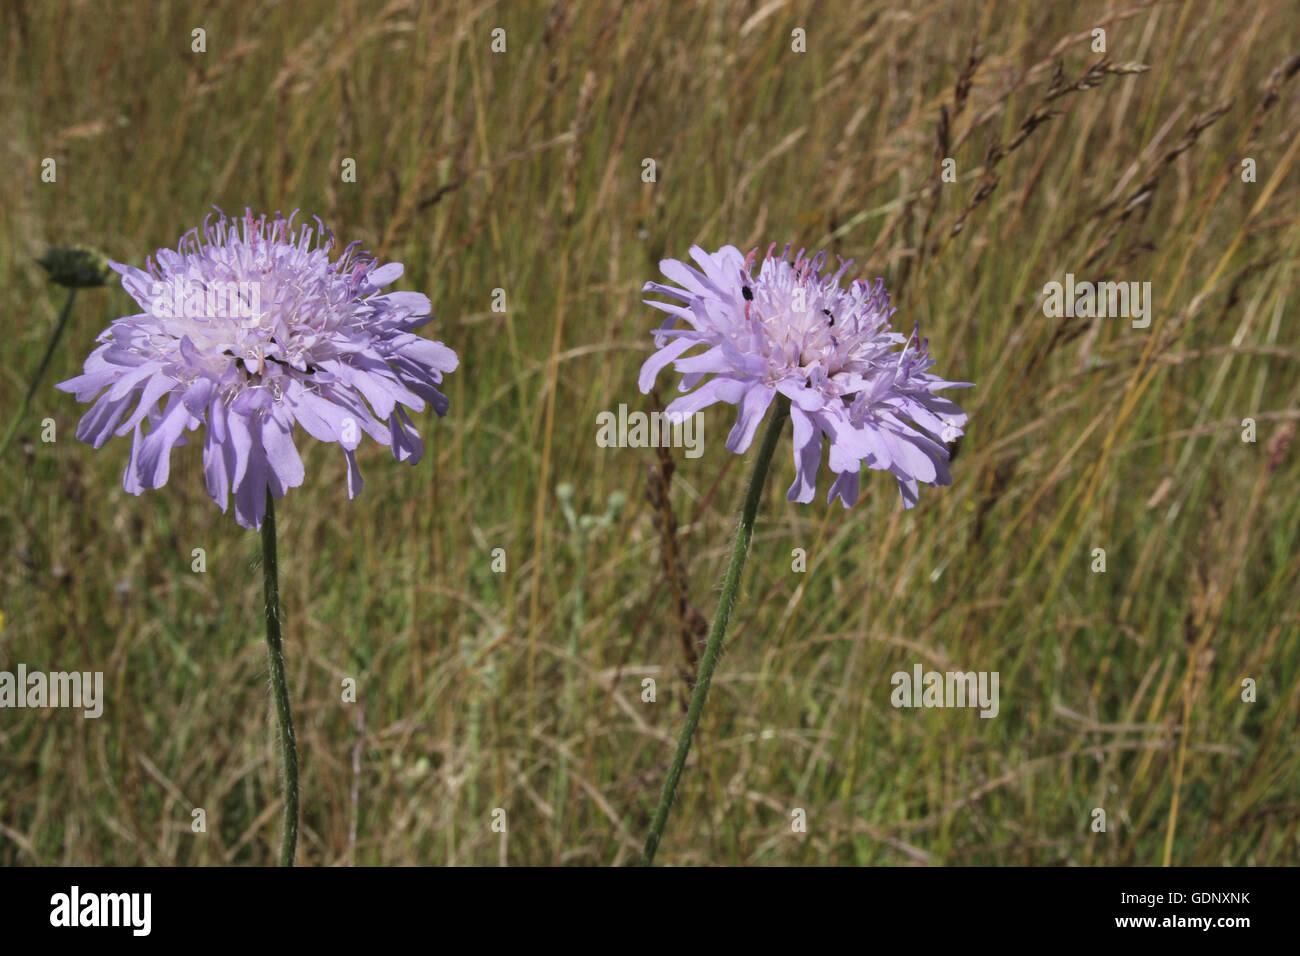 Field scabious flower heads - Stock Image